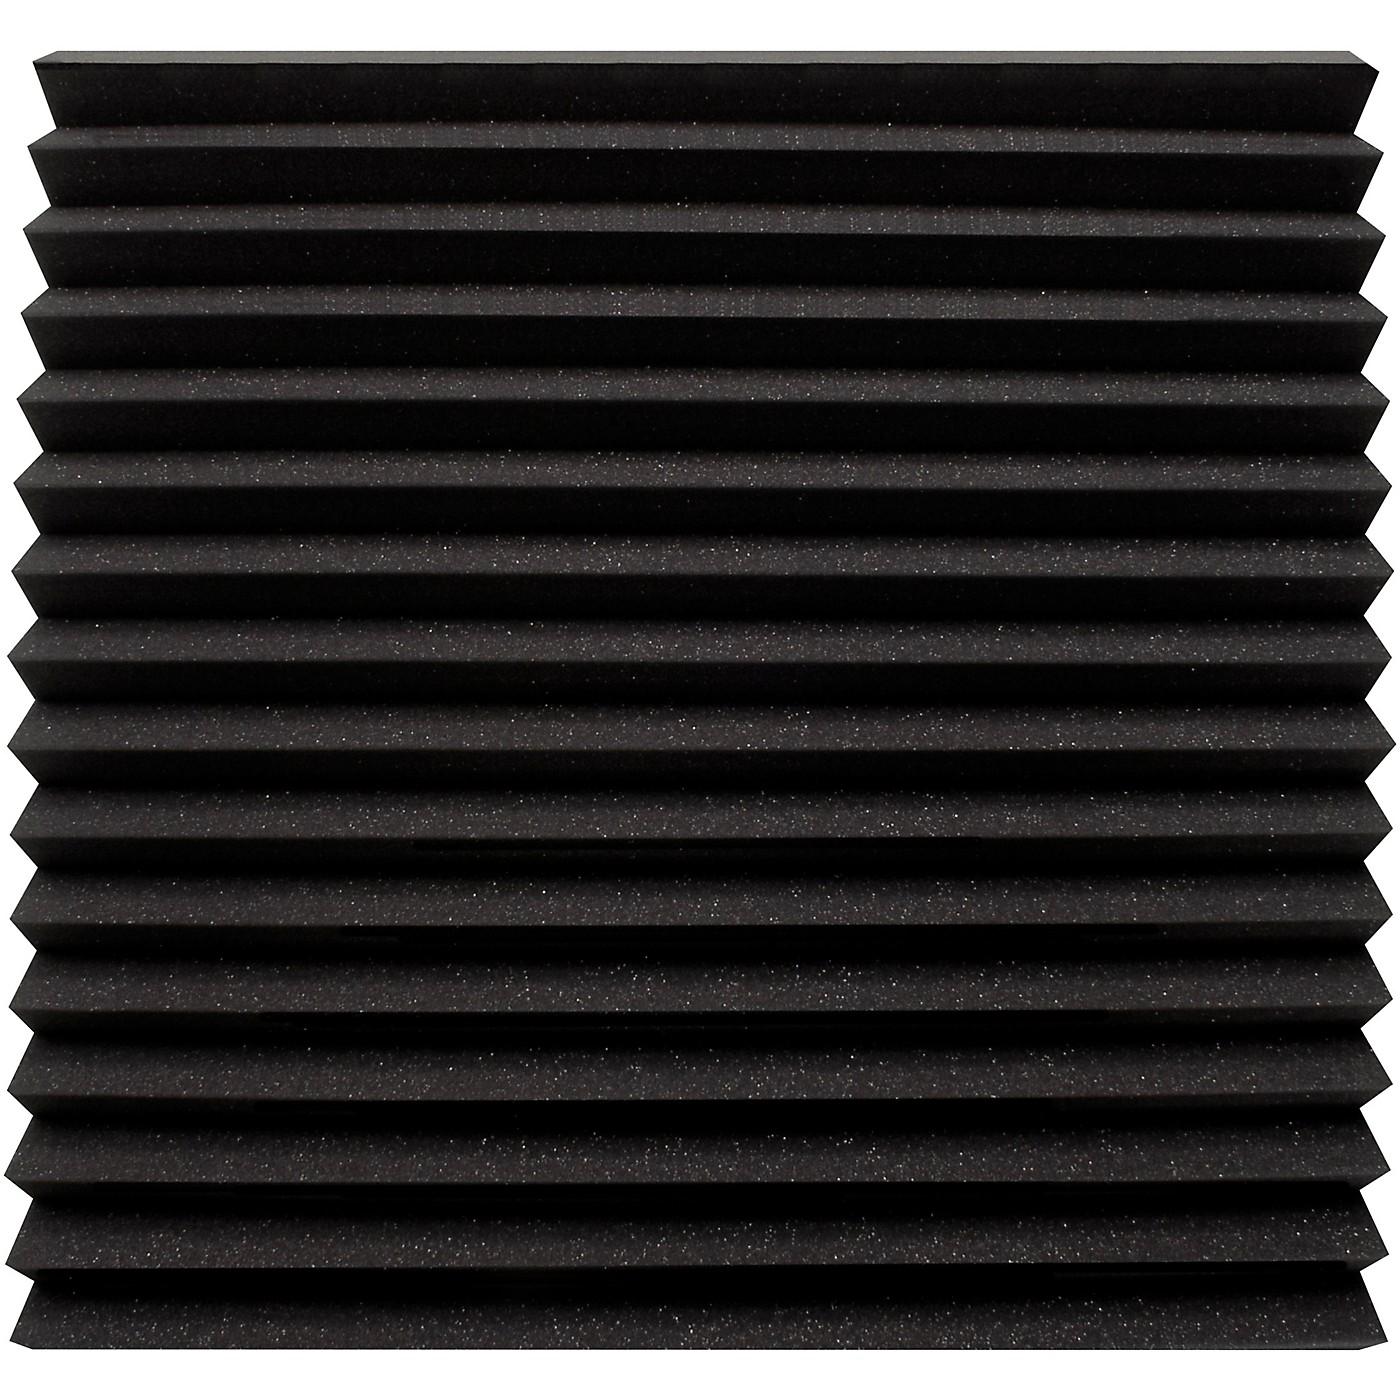 Ultimate Acoustics Acoustic Foam - 24x24x2 Wedge (12 Pack) thumbnail